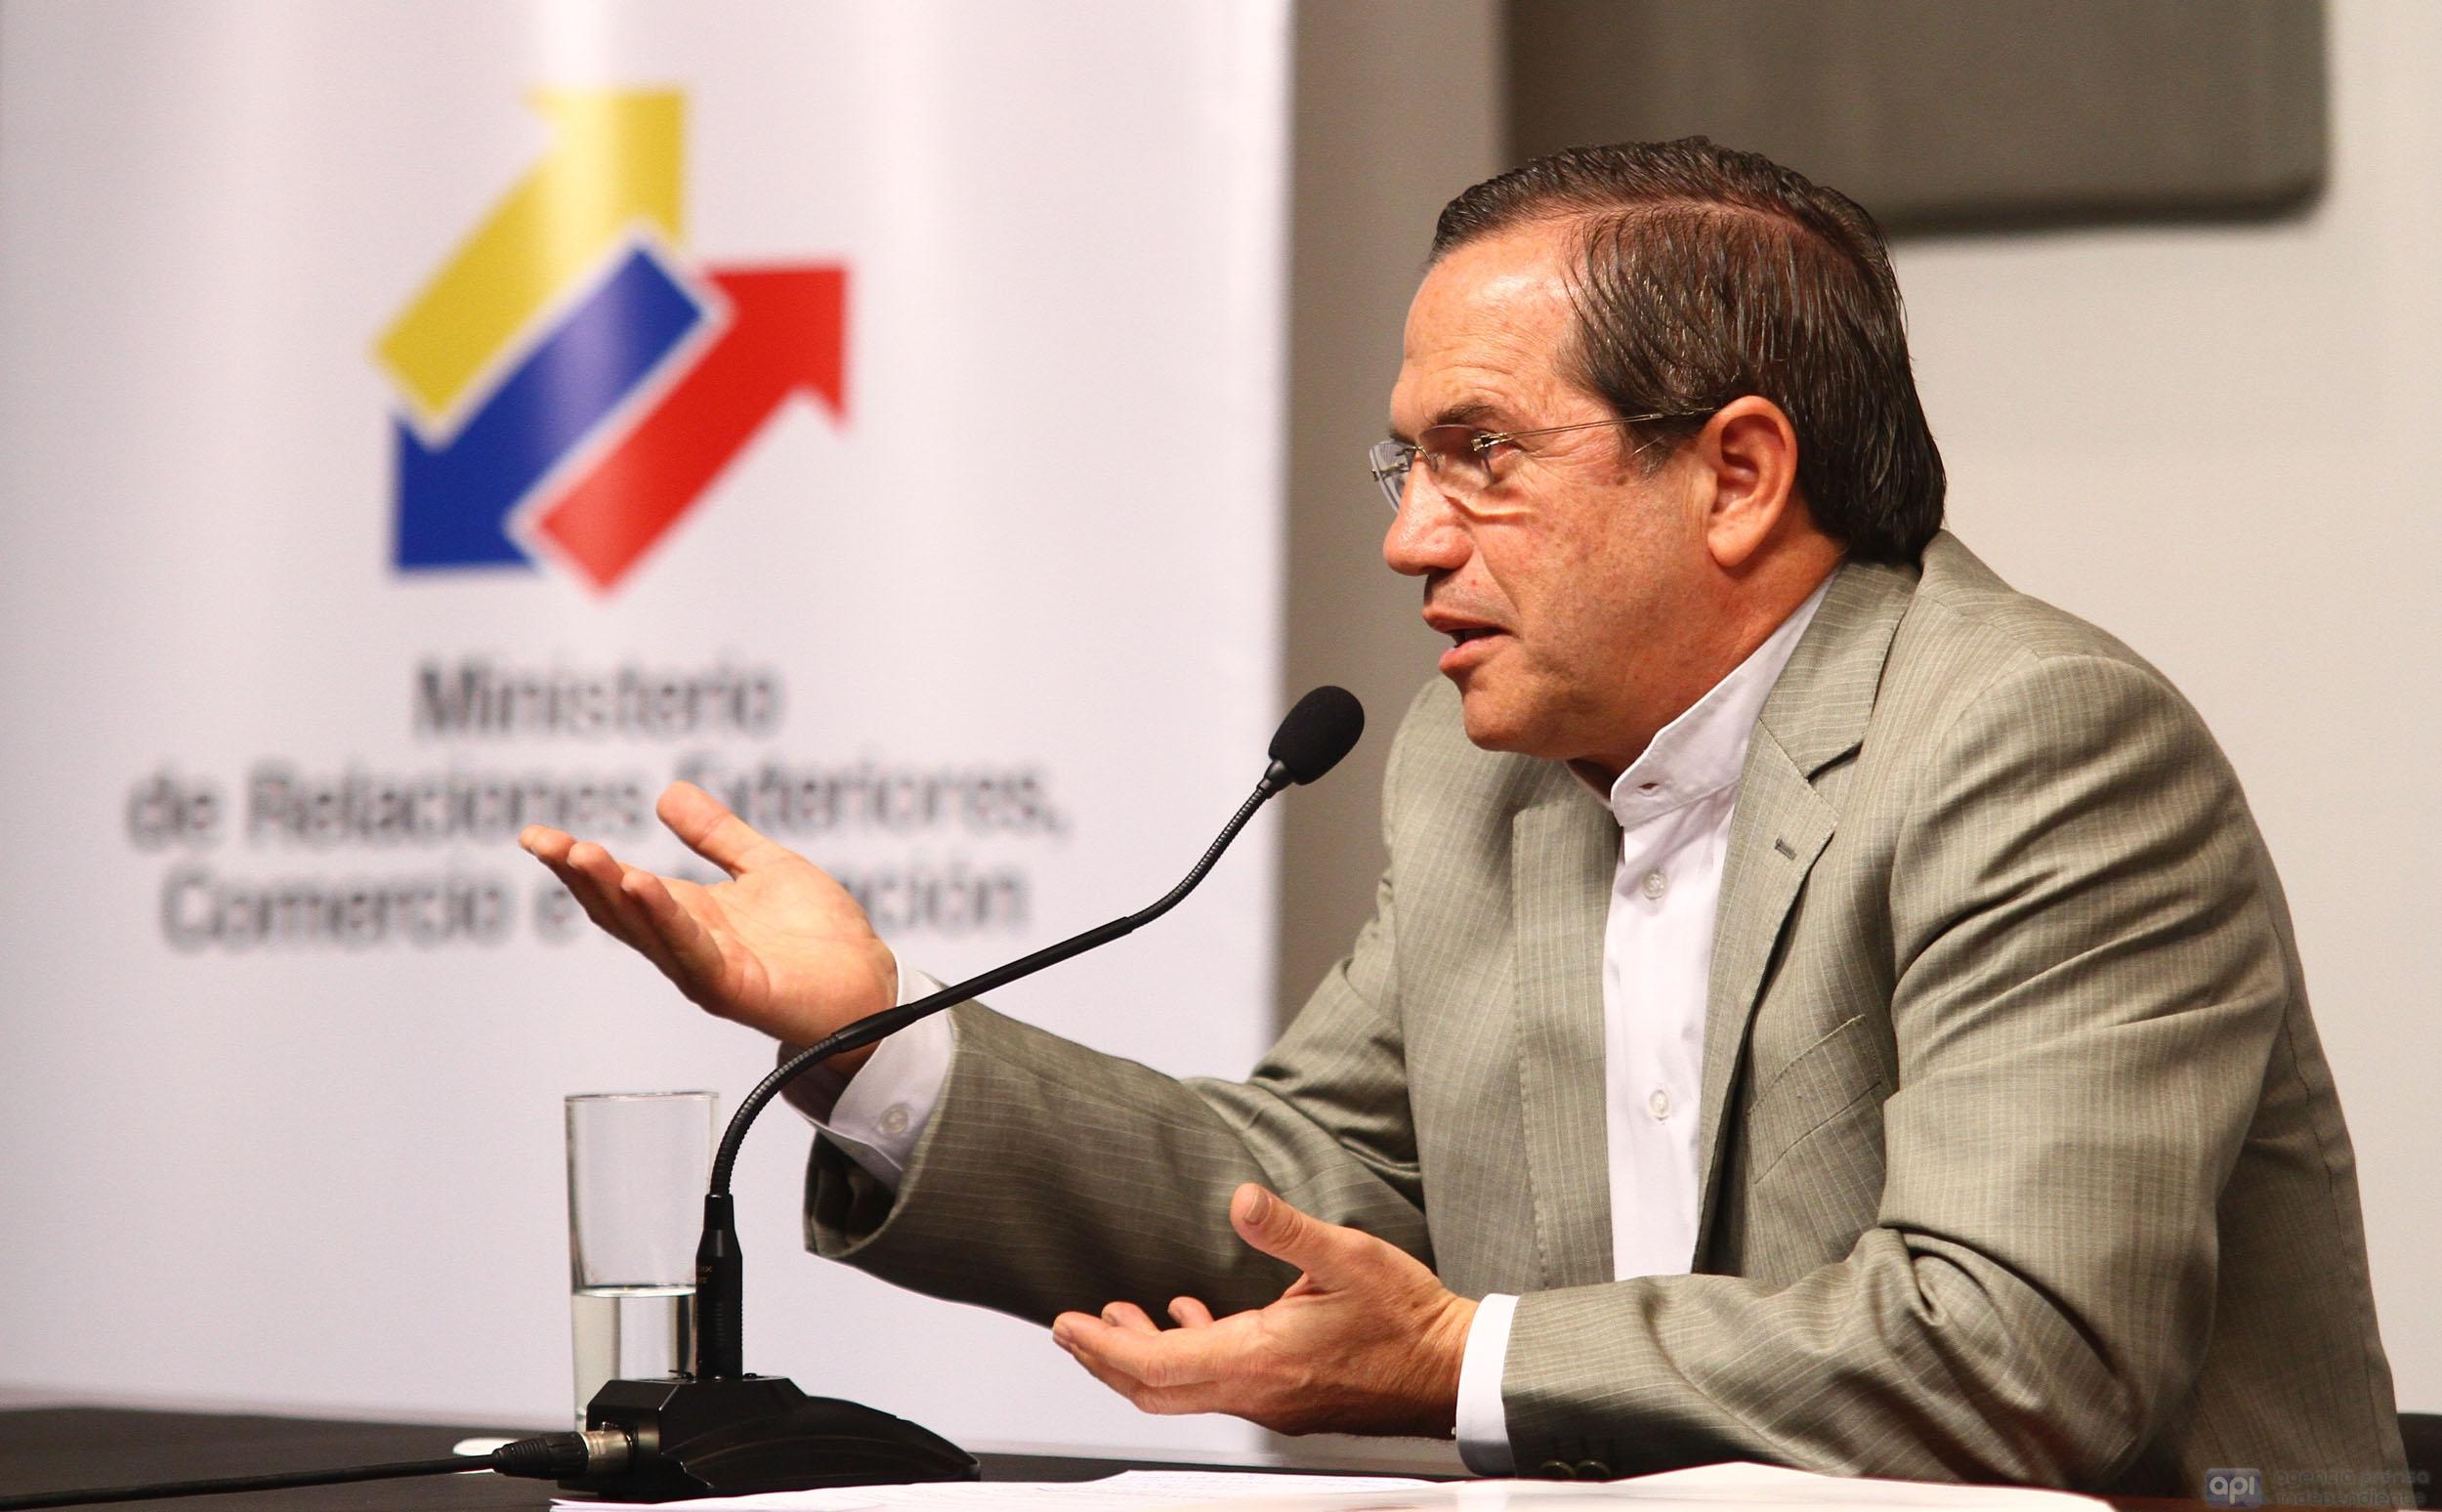 QUITO 2 DE FEBRERO 2012. RICARDO PATIÑO HABLA SOBRE LAS DIFERENCIAS CON LA UNION EUROPEA. FOTOS API / JUAN CEVALLOS.